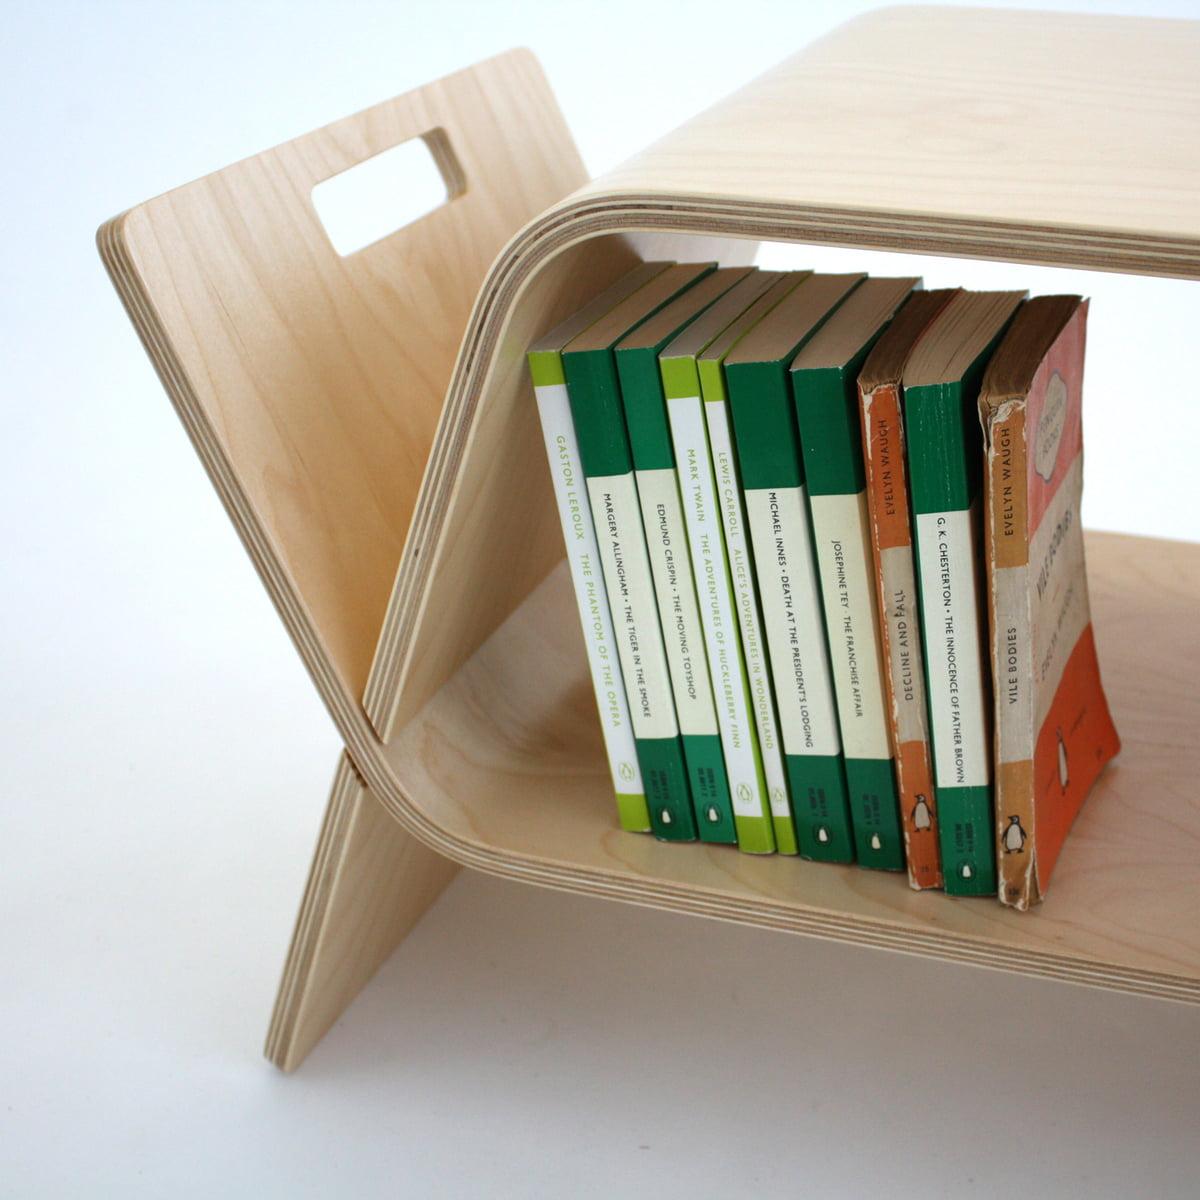 Embrace Multifunktionsmöbel von Johngreen.